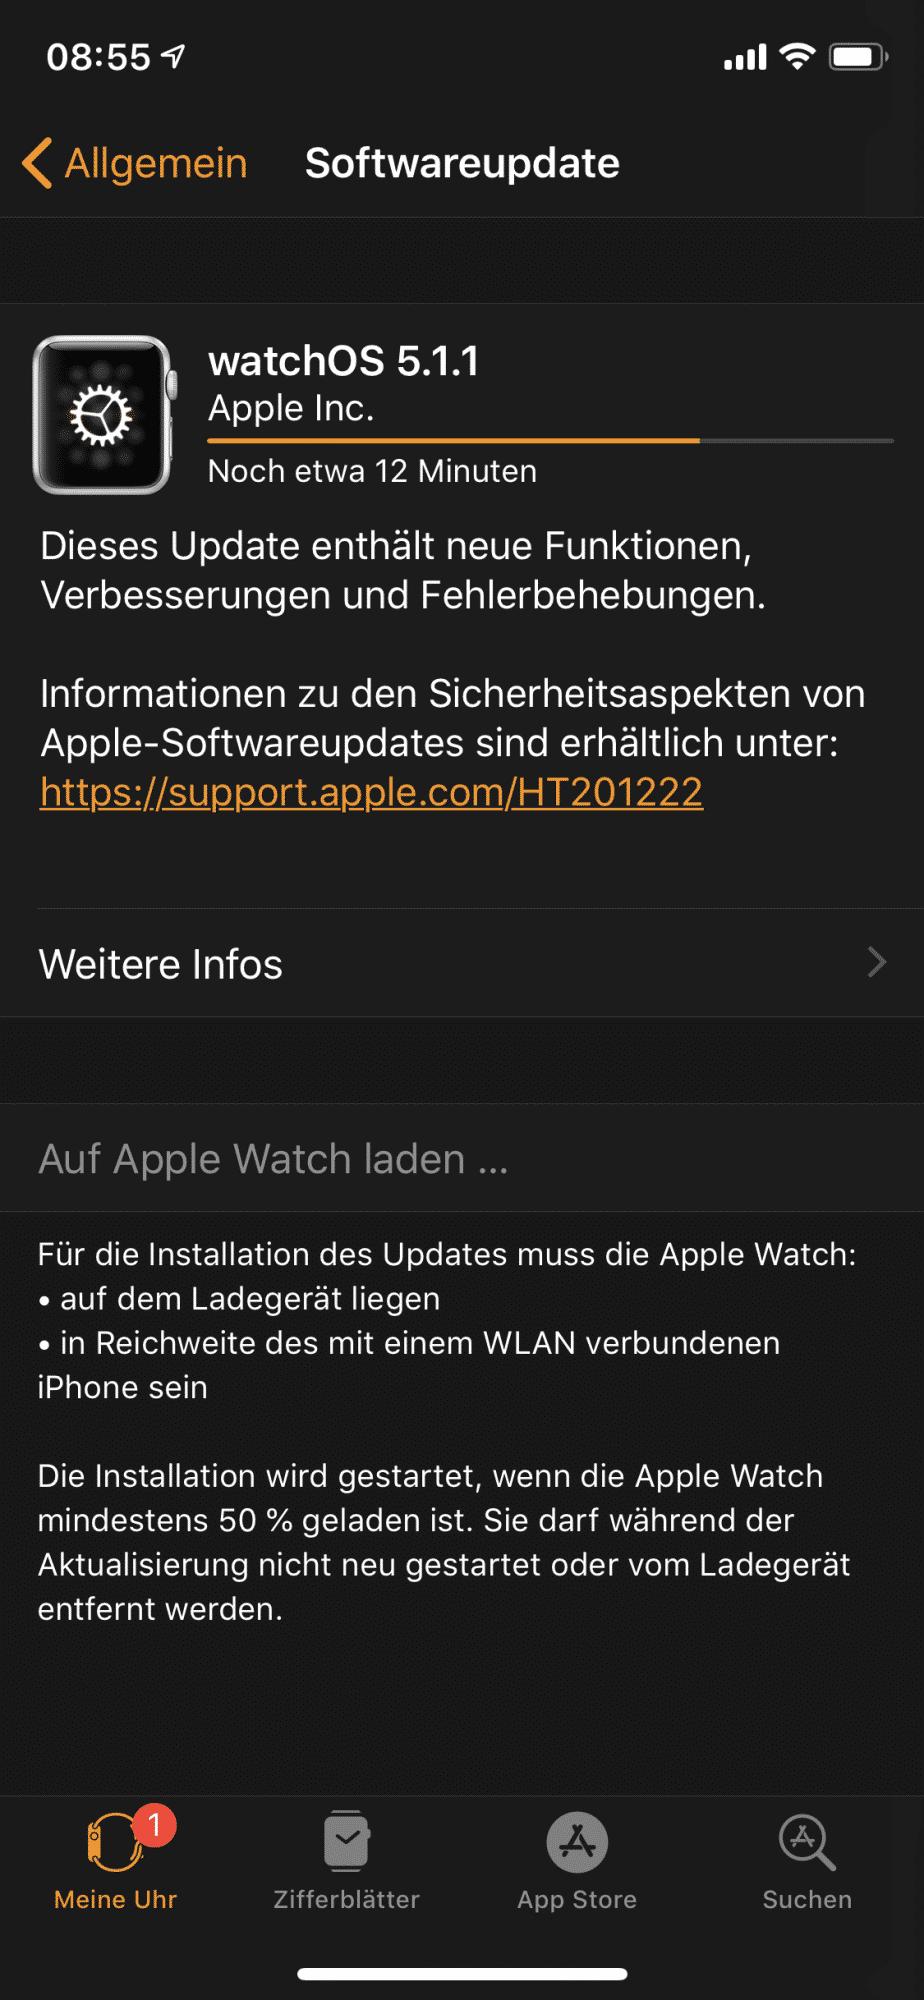 watchOS 5.1.1 Download